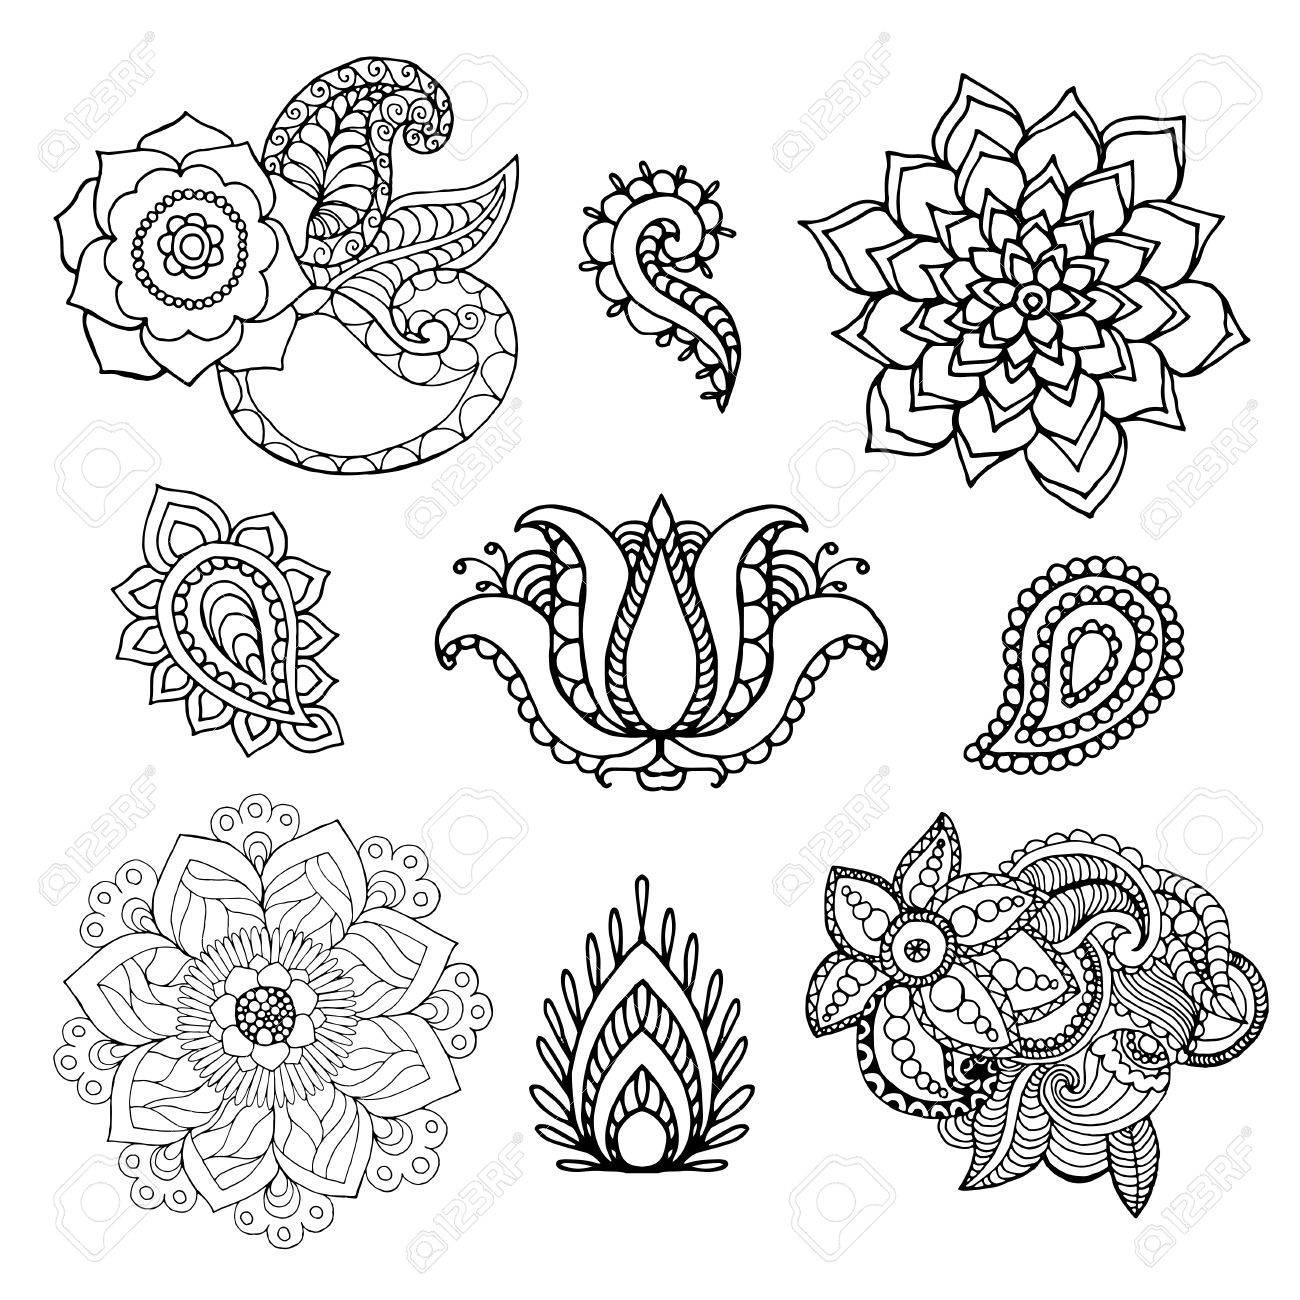 1300x1300 Henna Doodle Vector Elements. Ethnic Floral Zentangle Black White